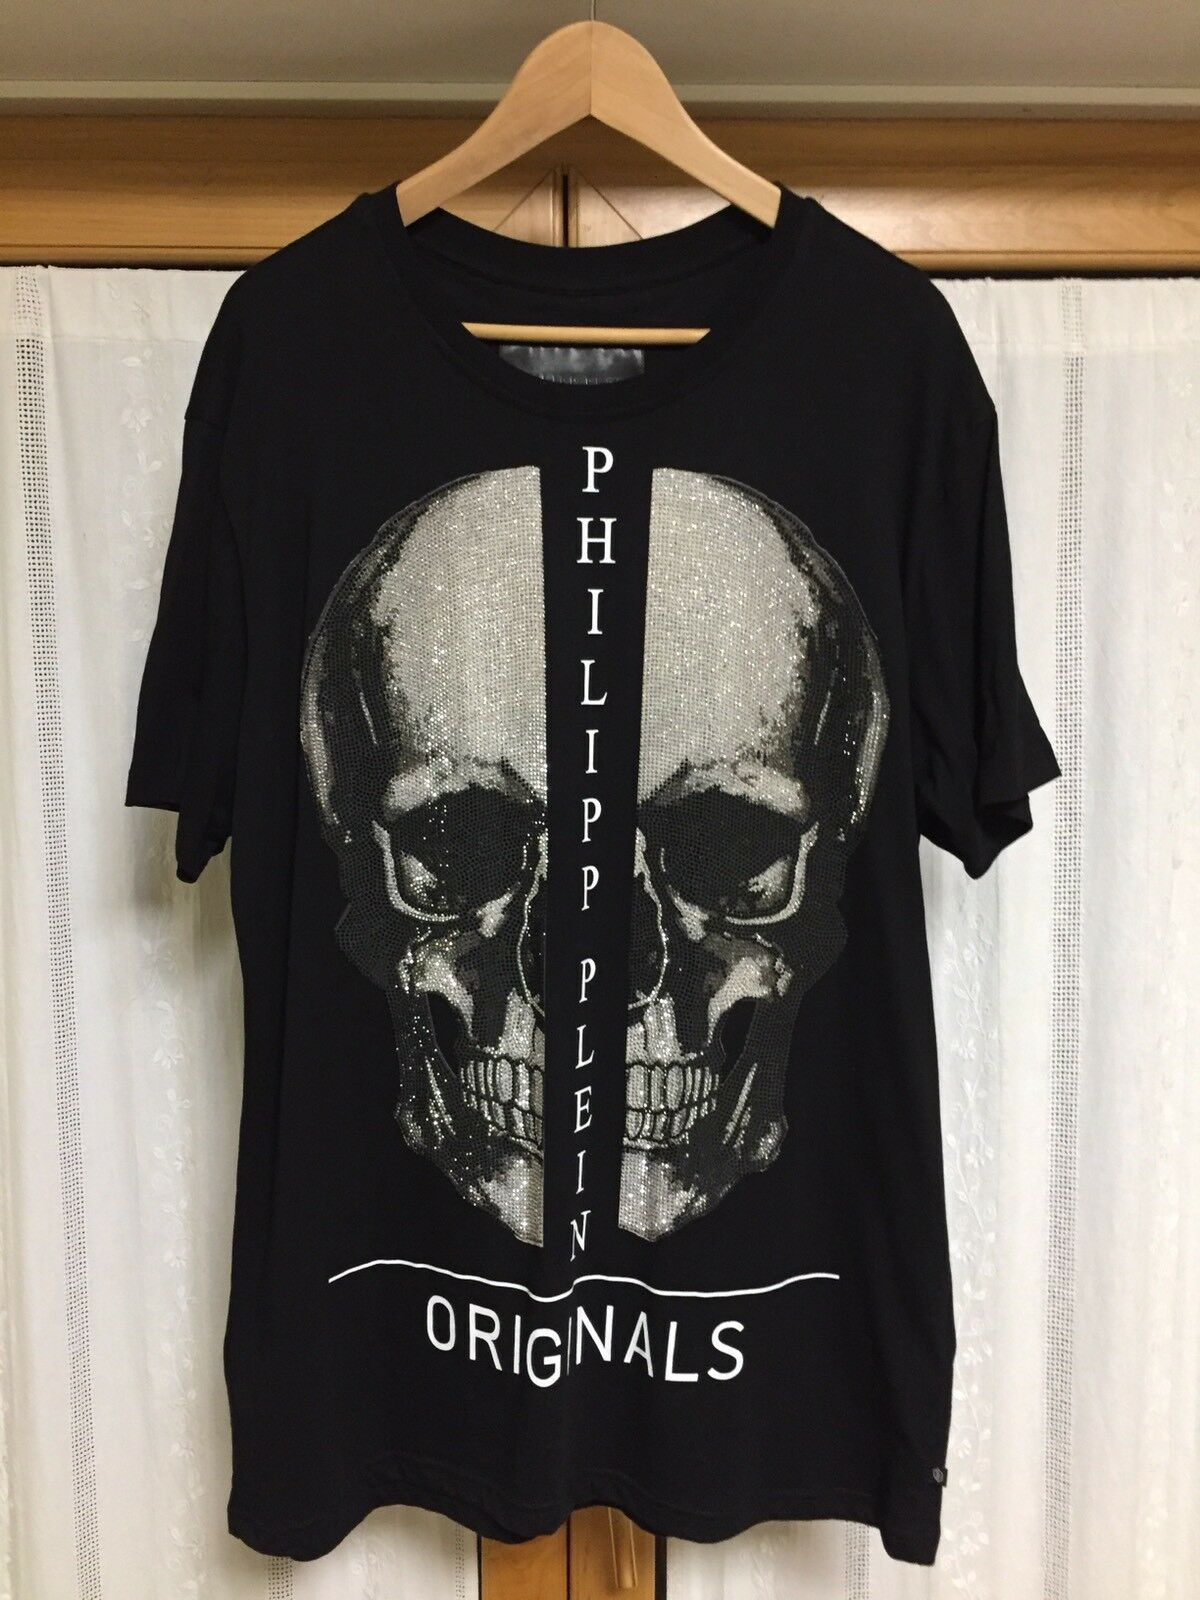 48953e7f4726 Shirt Uomo Philipp Plein XXXL Originale T nuqlyf8965-T-shirt - www ...